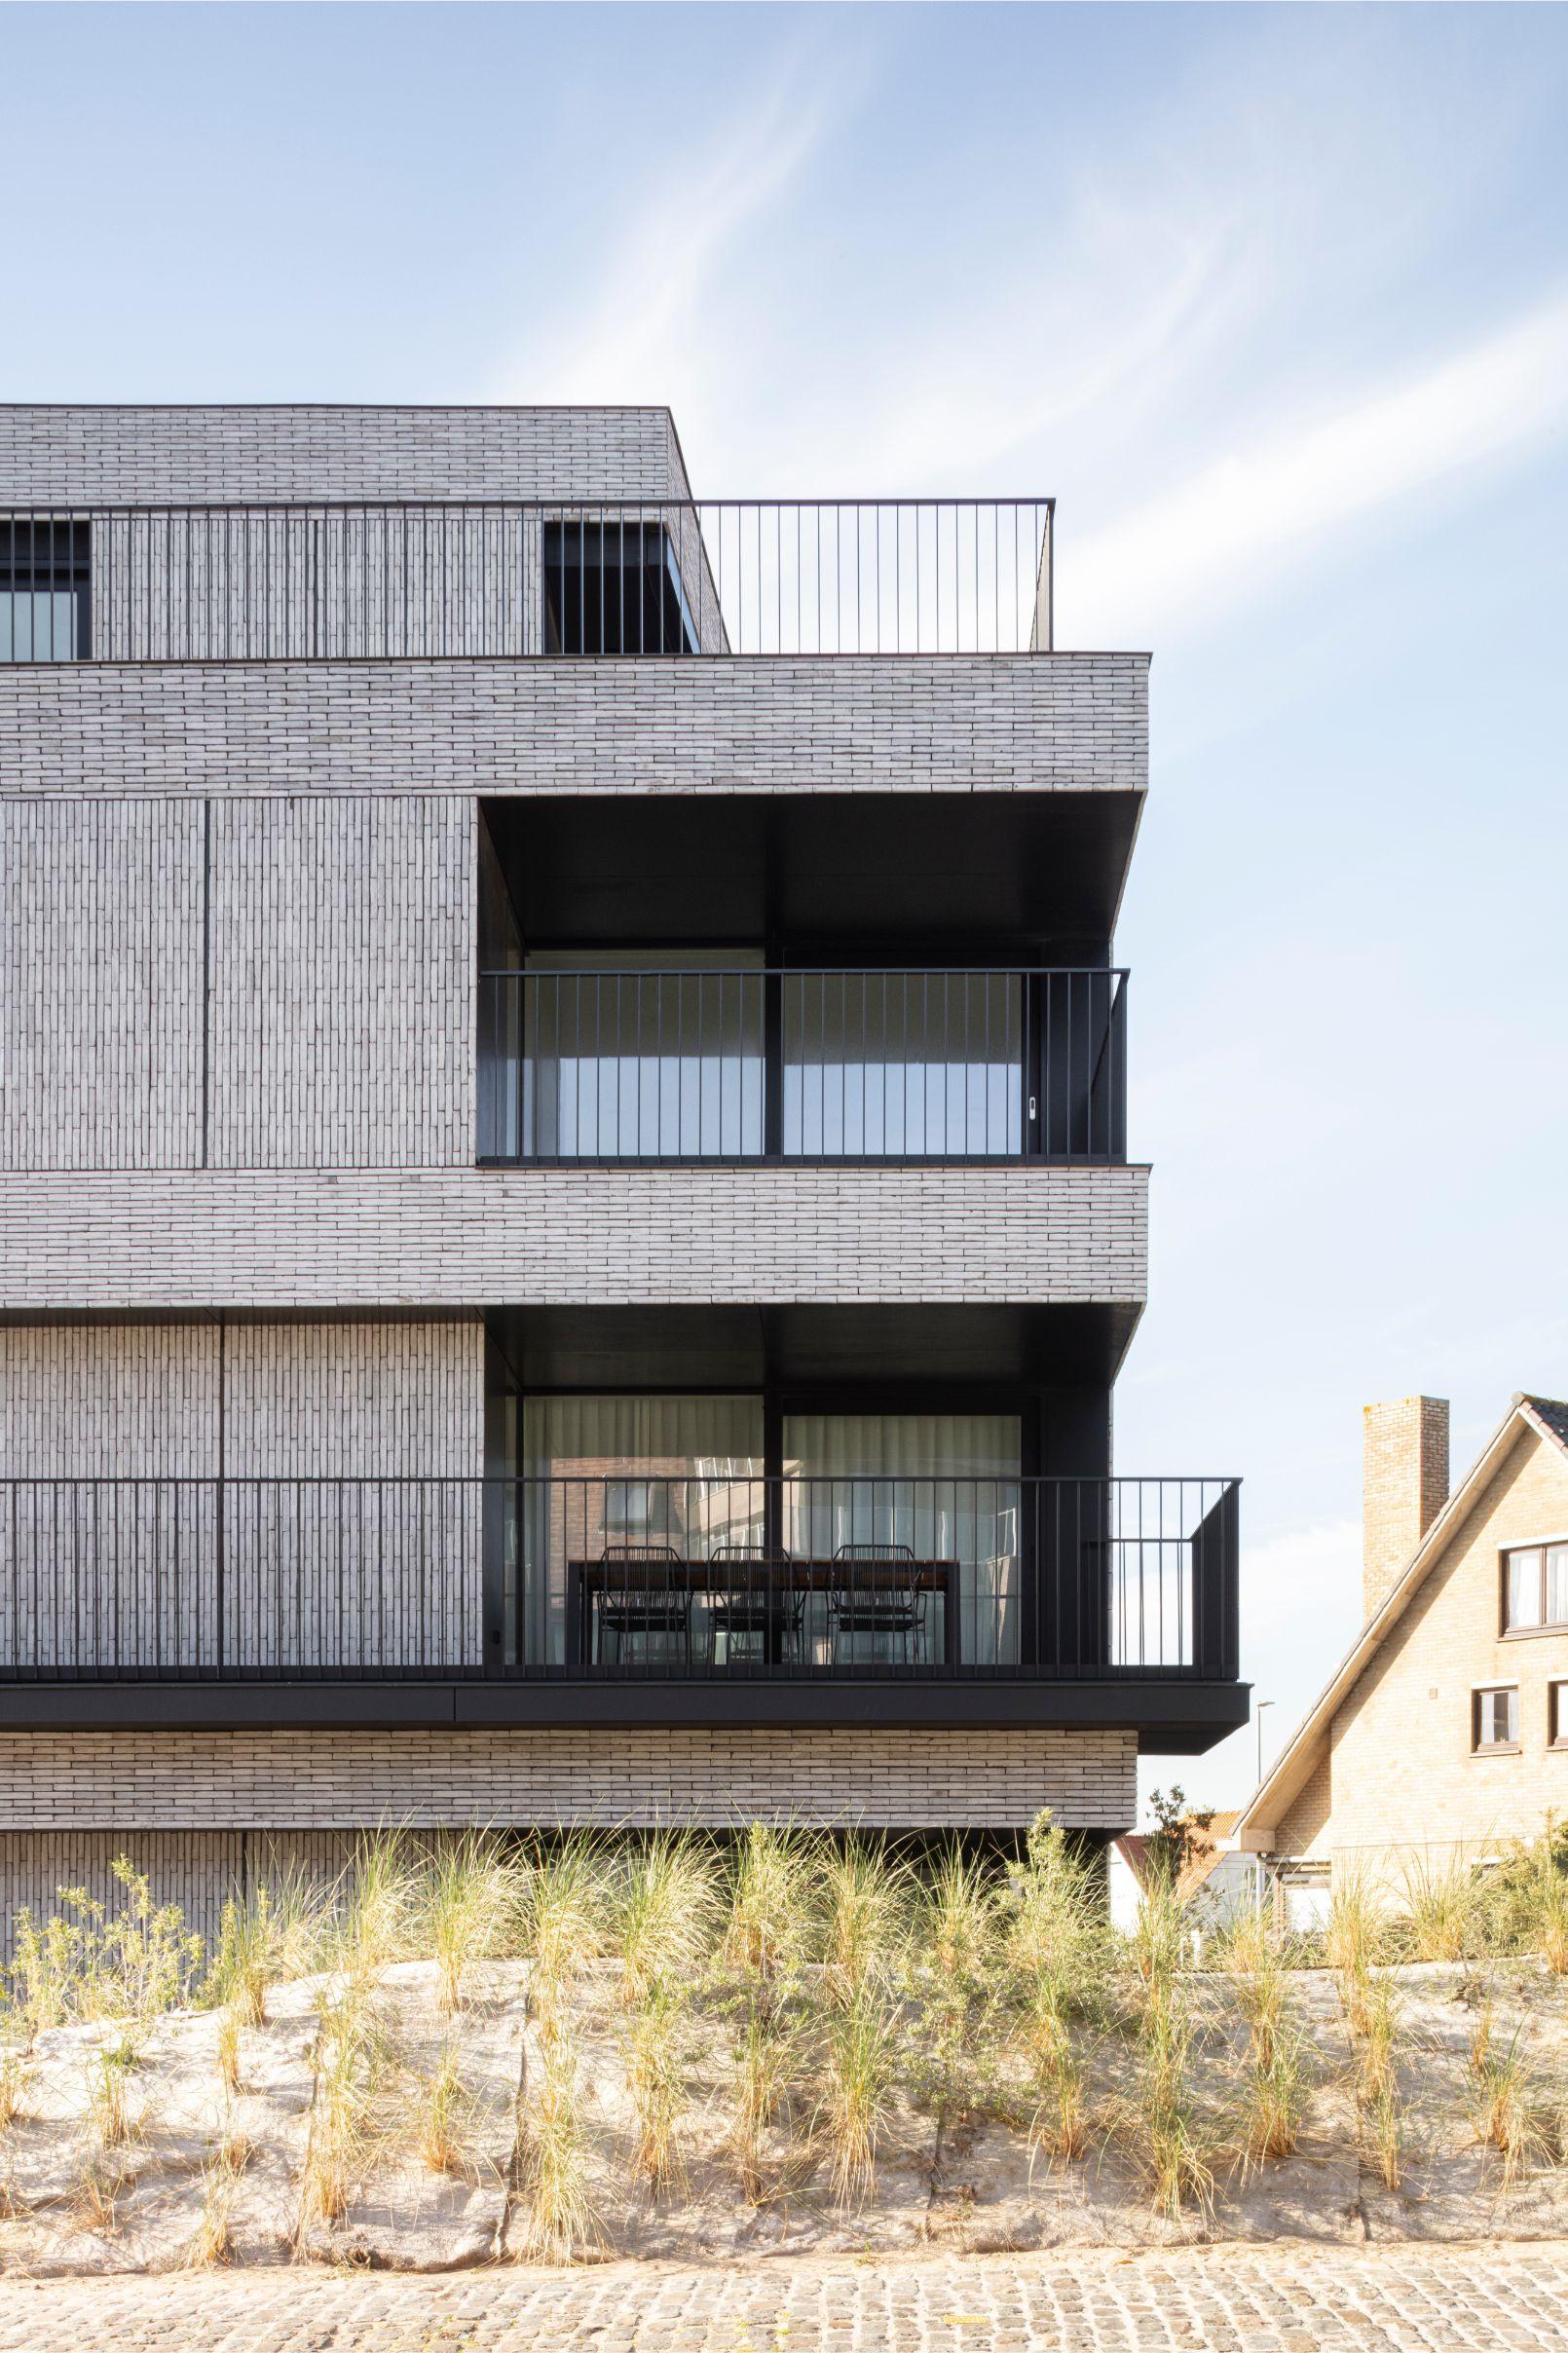 Pierre Paulin - Rietveldprojects - Sint-Idesbald - Tvdv1